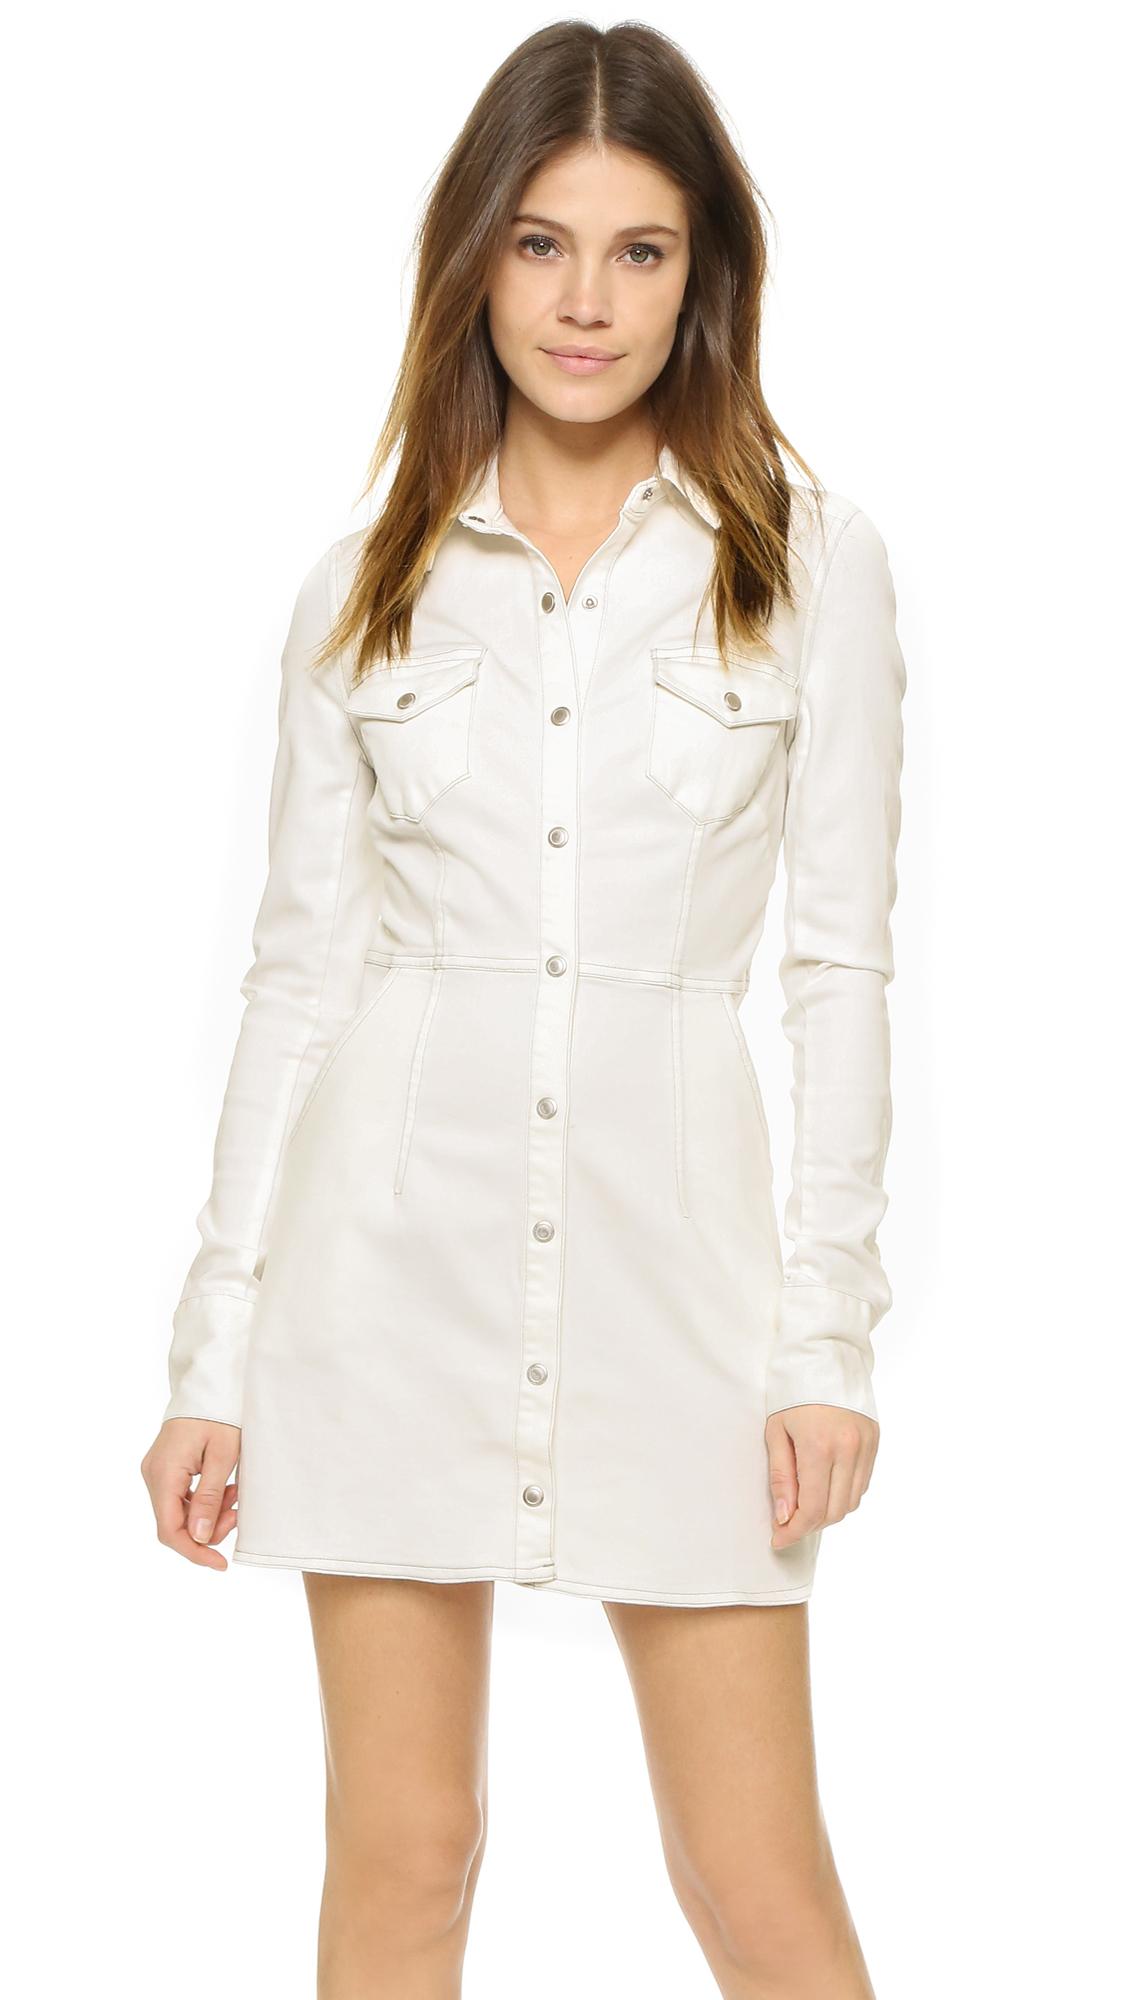 7352c44631d Lyst - Free People Dynamite Denim Shirtdress in White